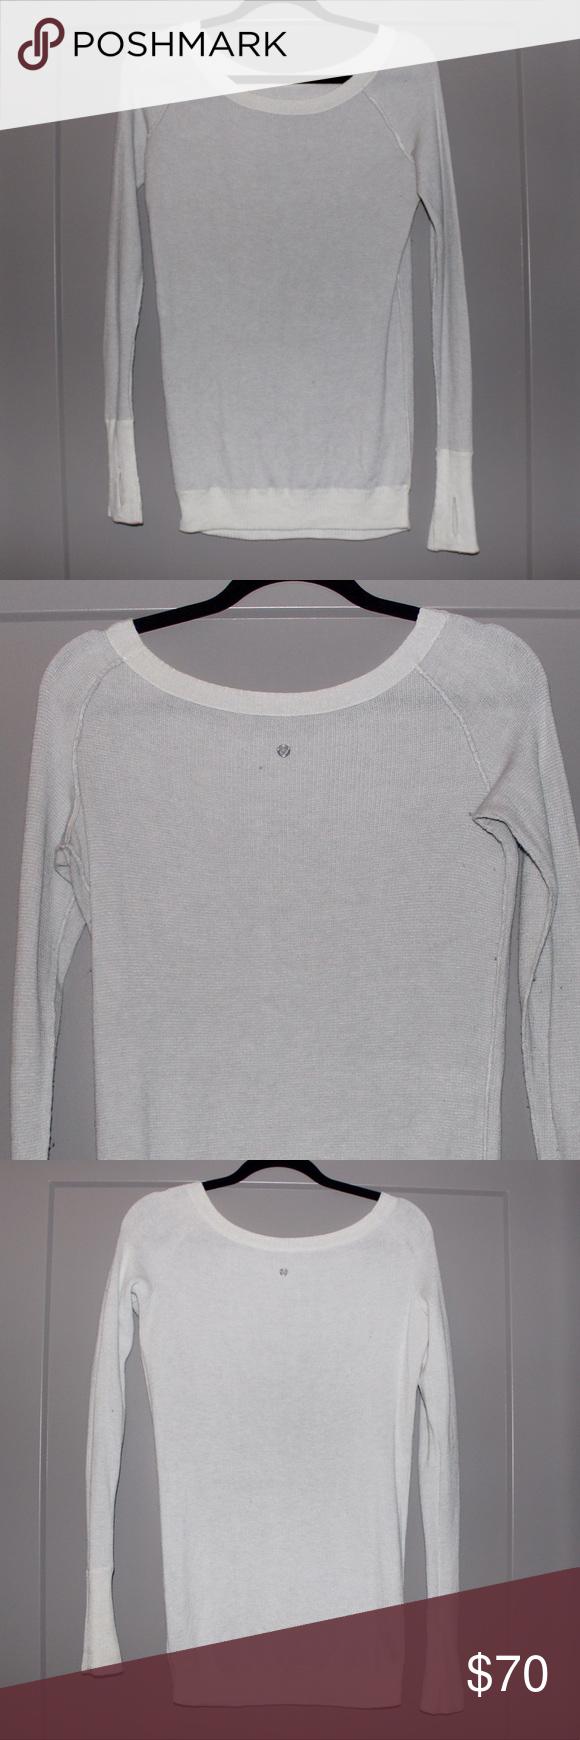 Lululemon Reversible Sweater | White sweaters, Lululemon and Gray